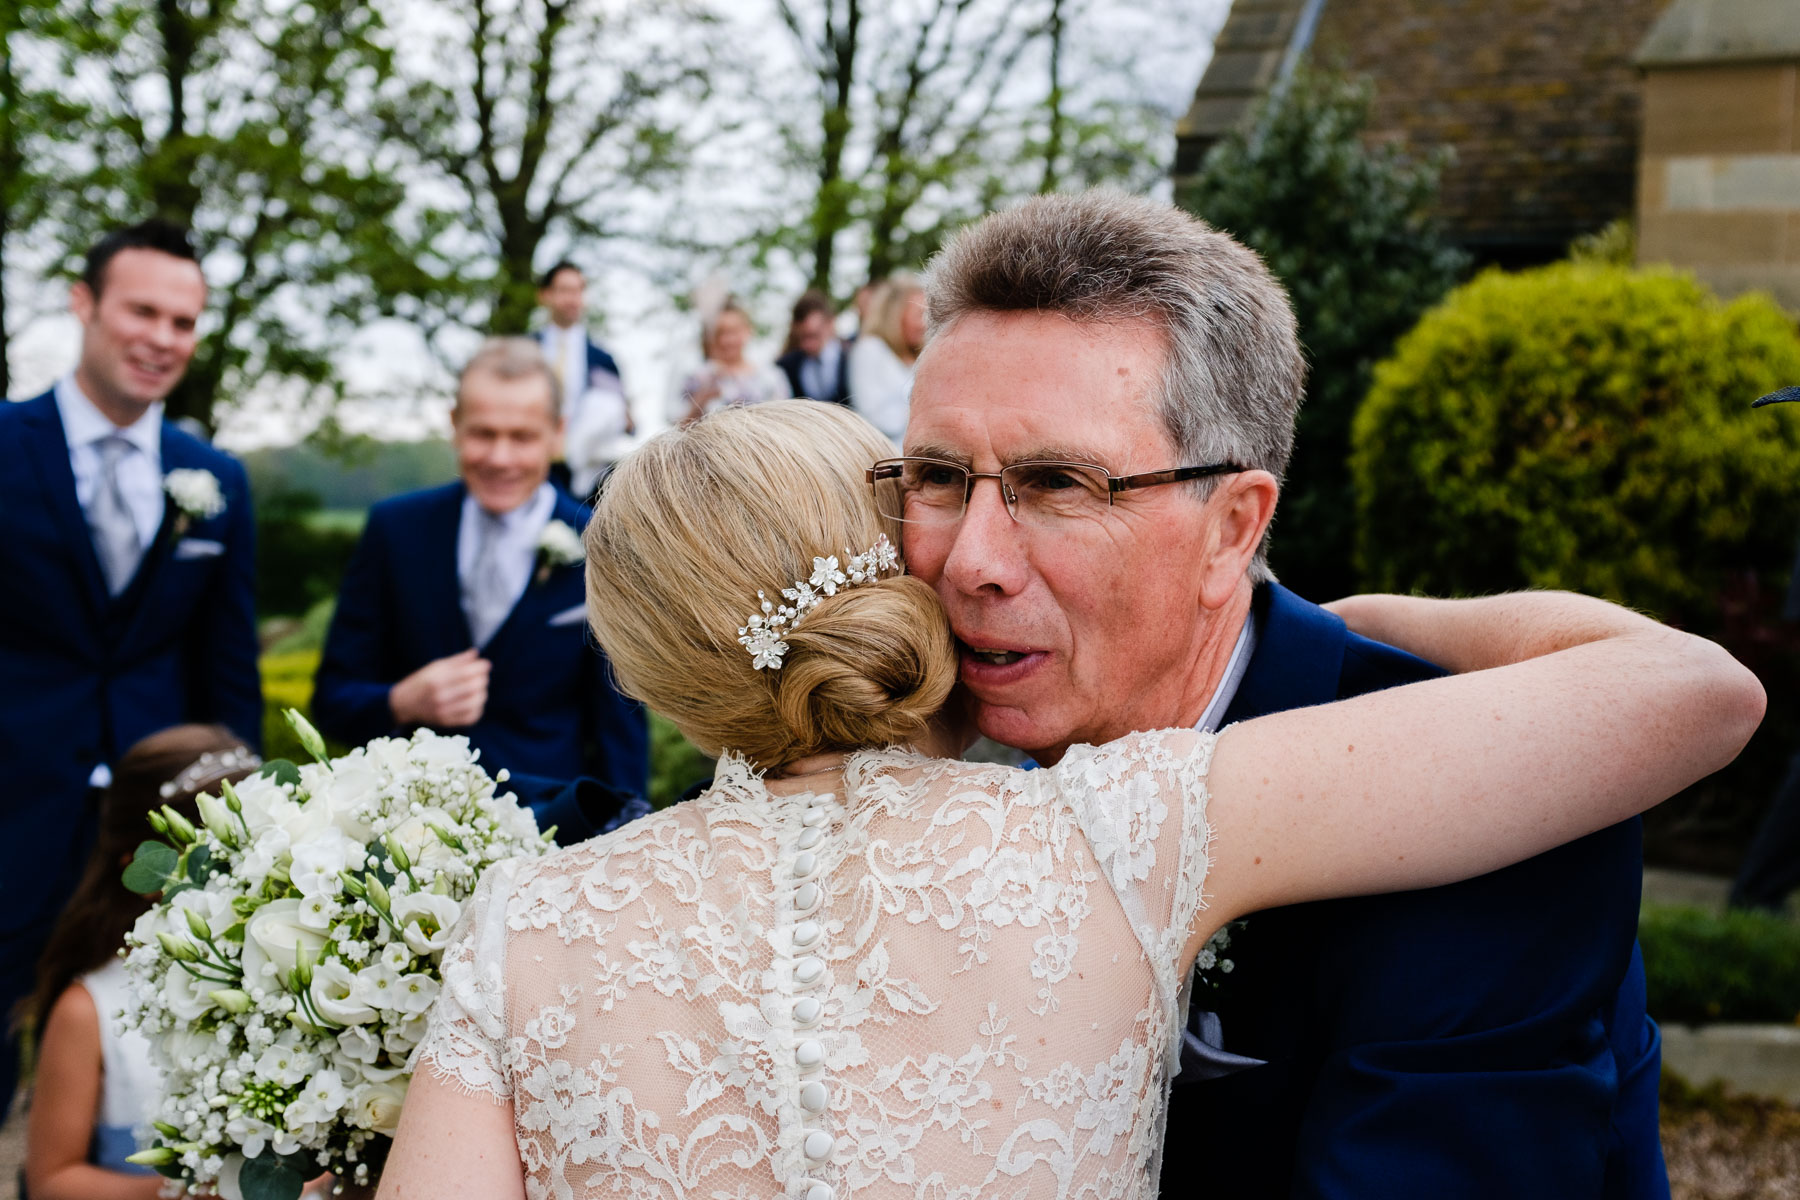 Crathorne Hall Wedding Photography - Jo & Paul (120).jpg